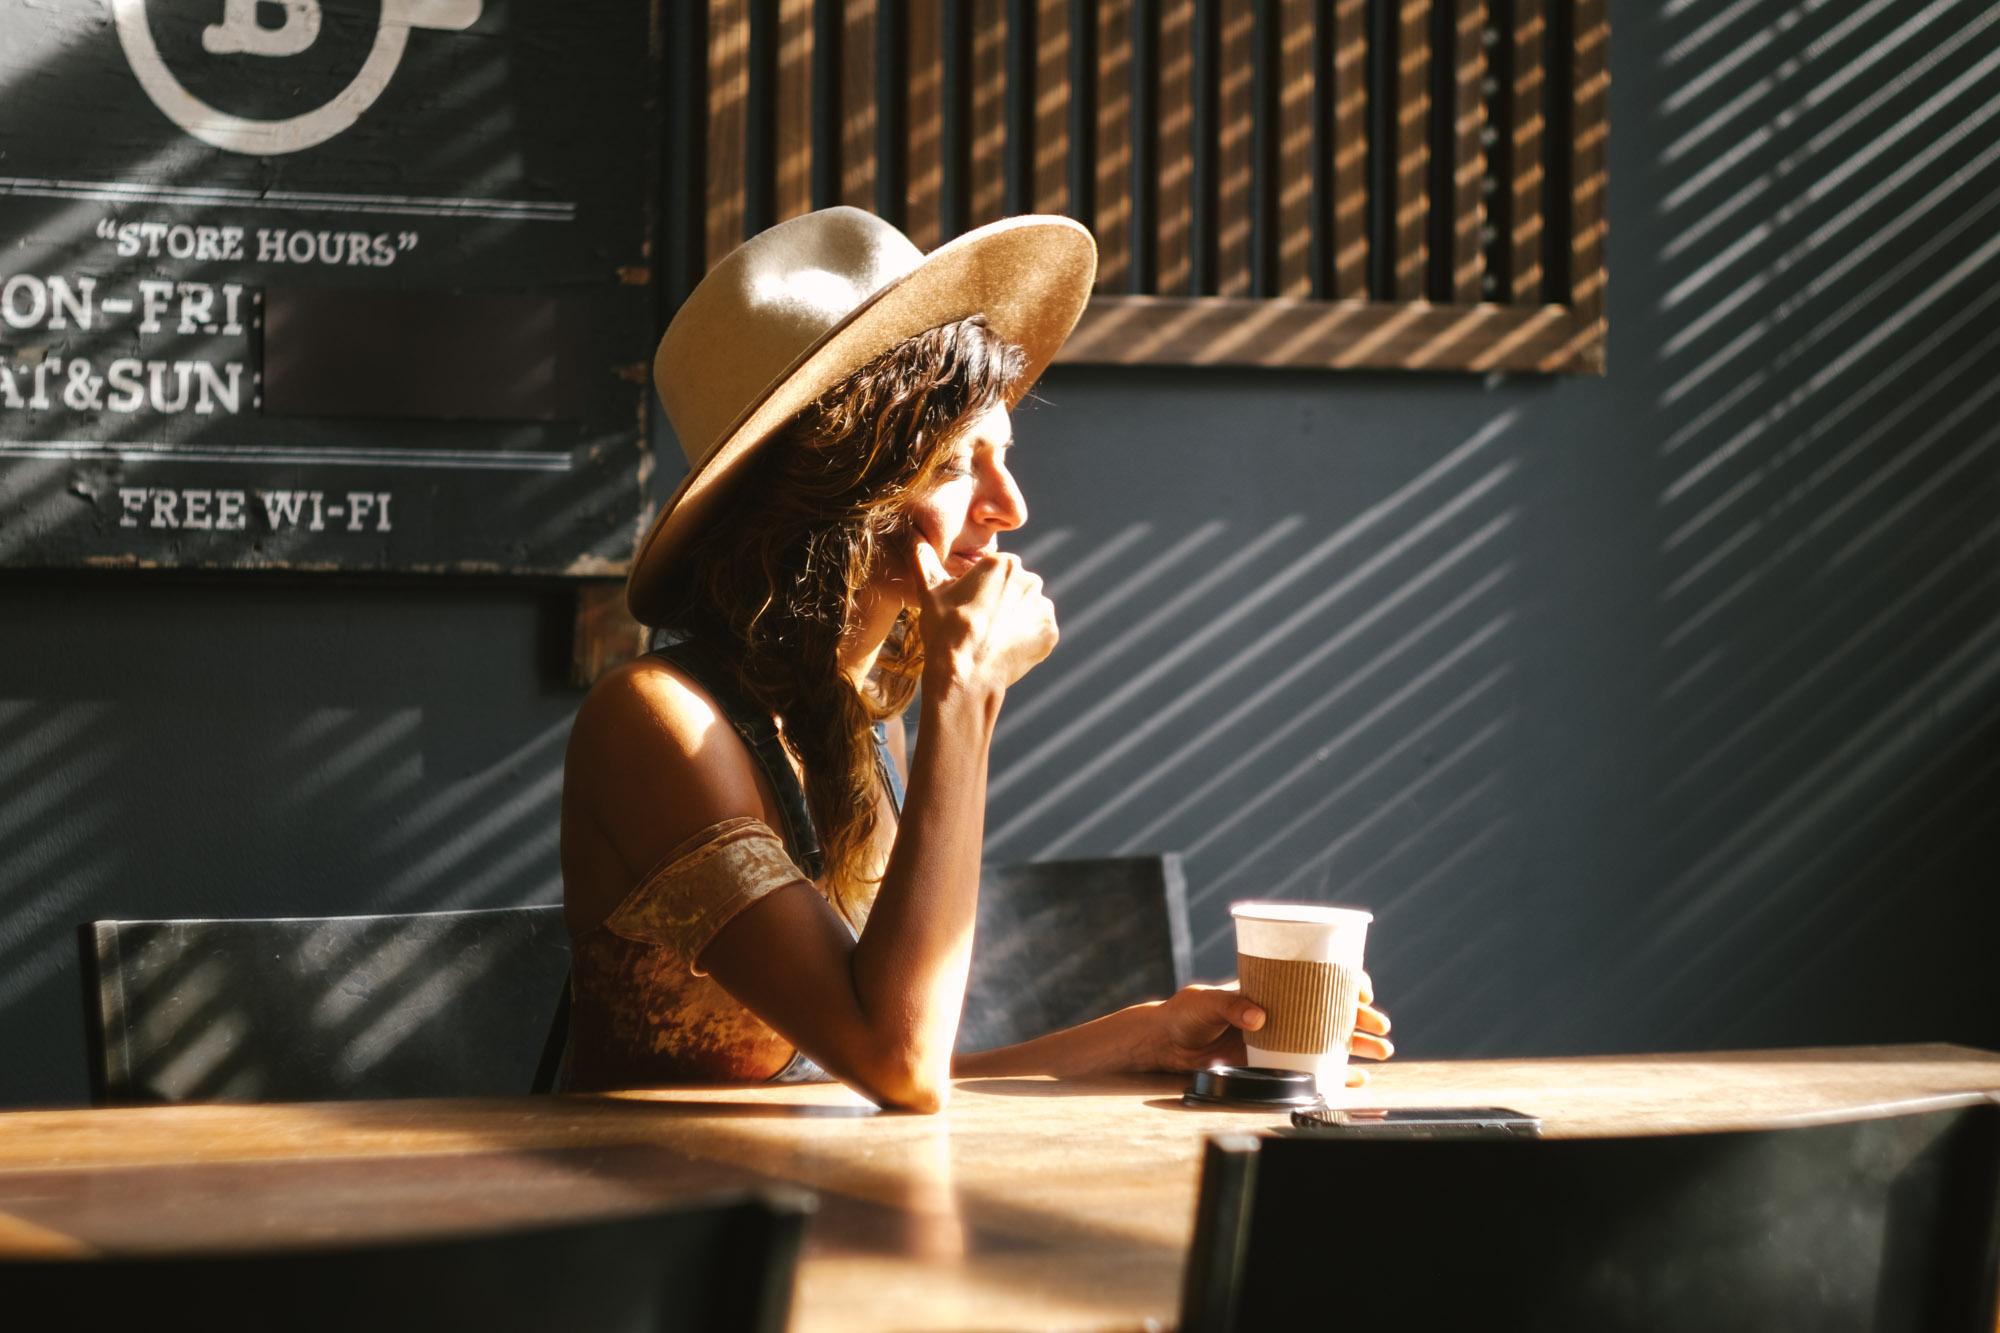 A woman in cafe in Williamsburg. Fuji X-Pro 1, Helios 44-4.